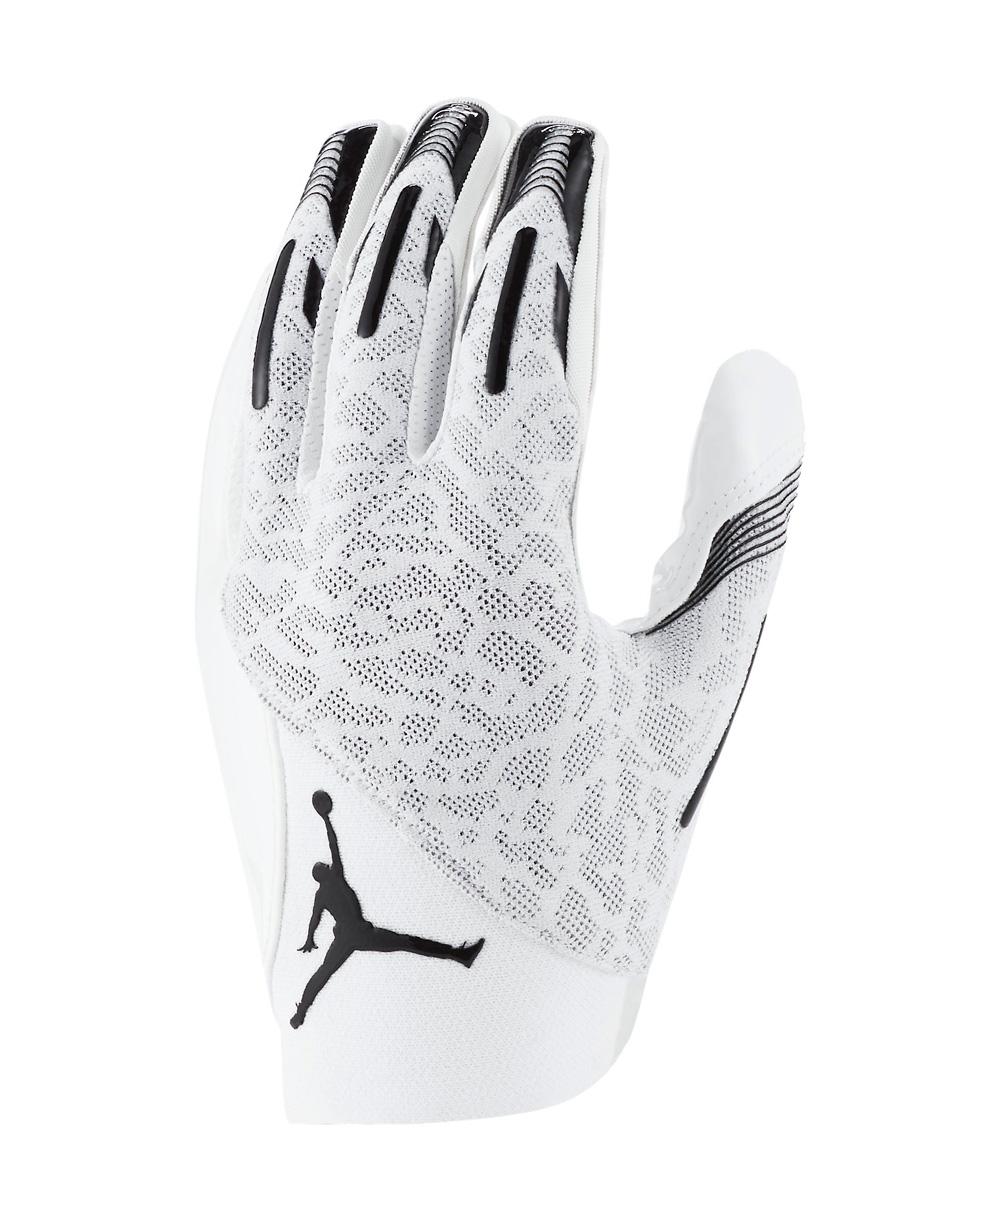 Jordan Knit Guantes Fútbol Americano para Hombre White